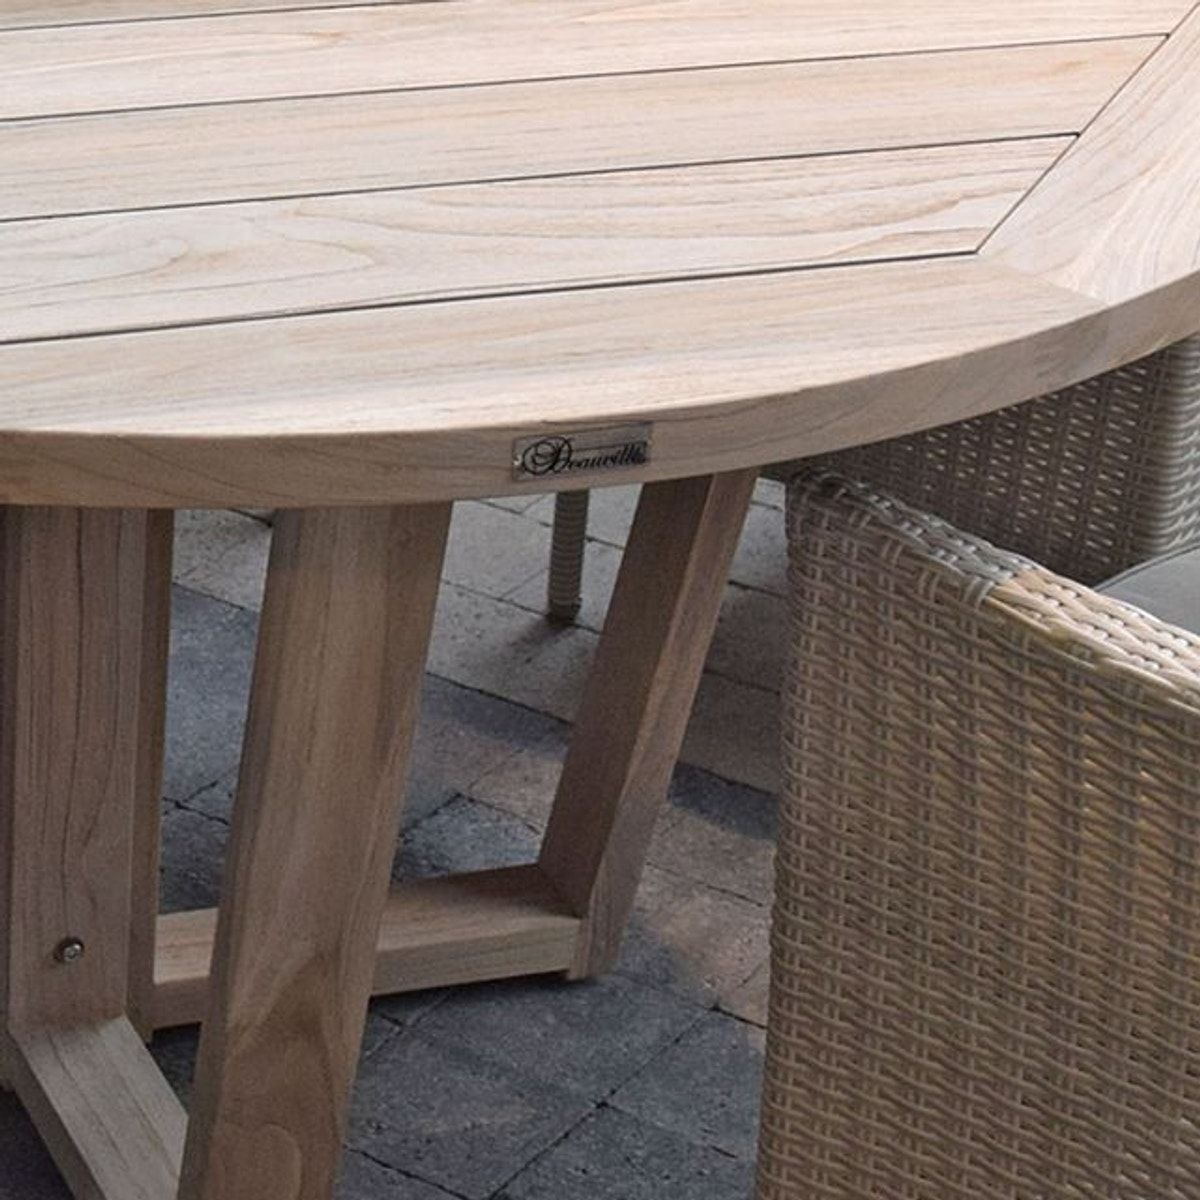 Table ronde en teck massif recycl 150 cm newhaven Mobilier de jardin en teck massif